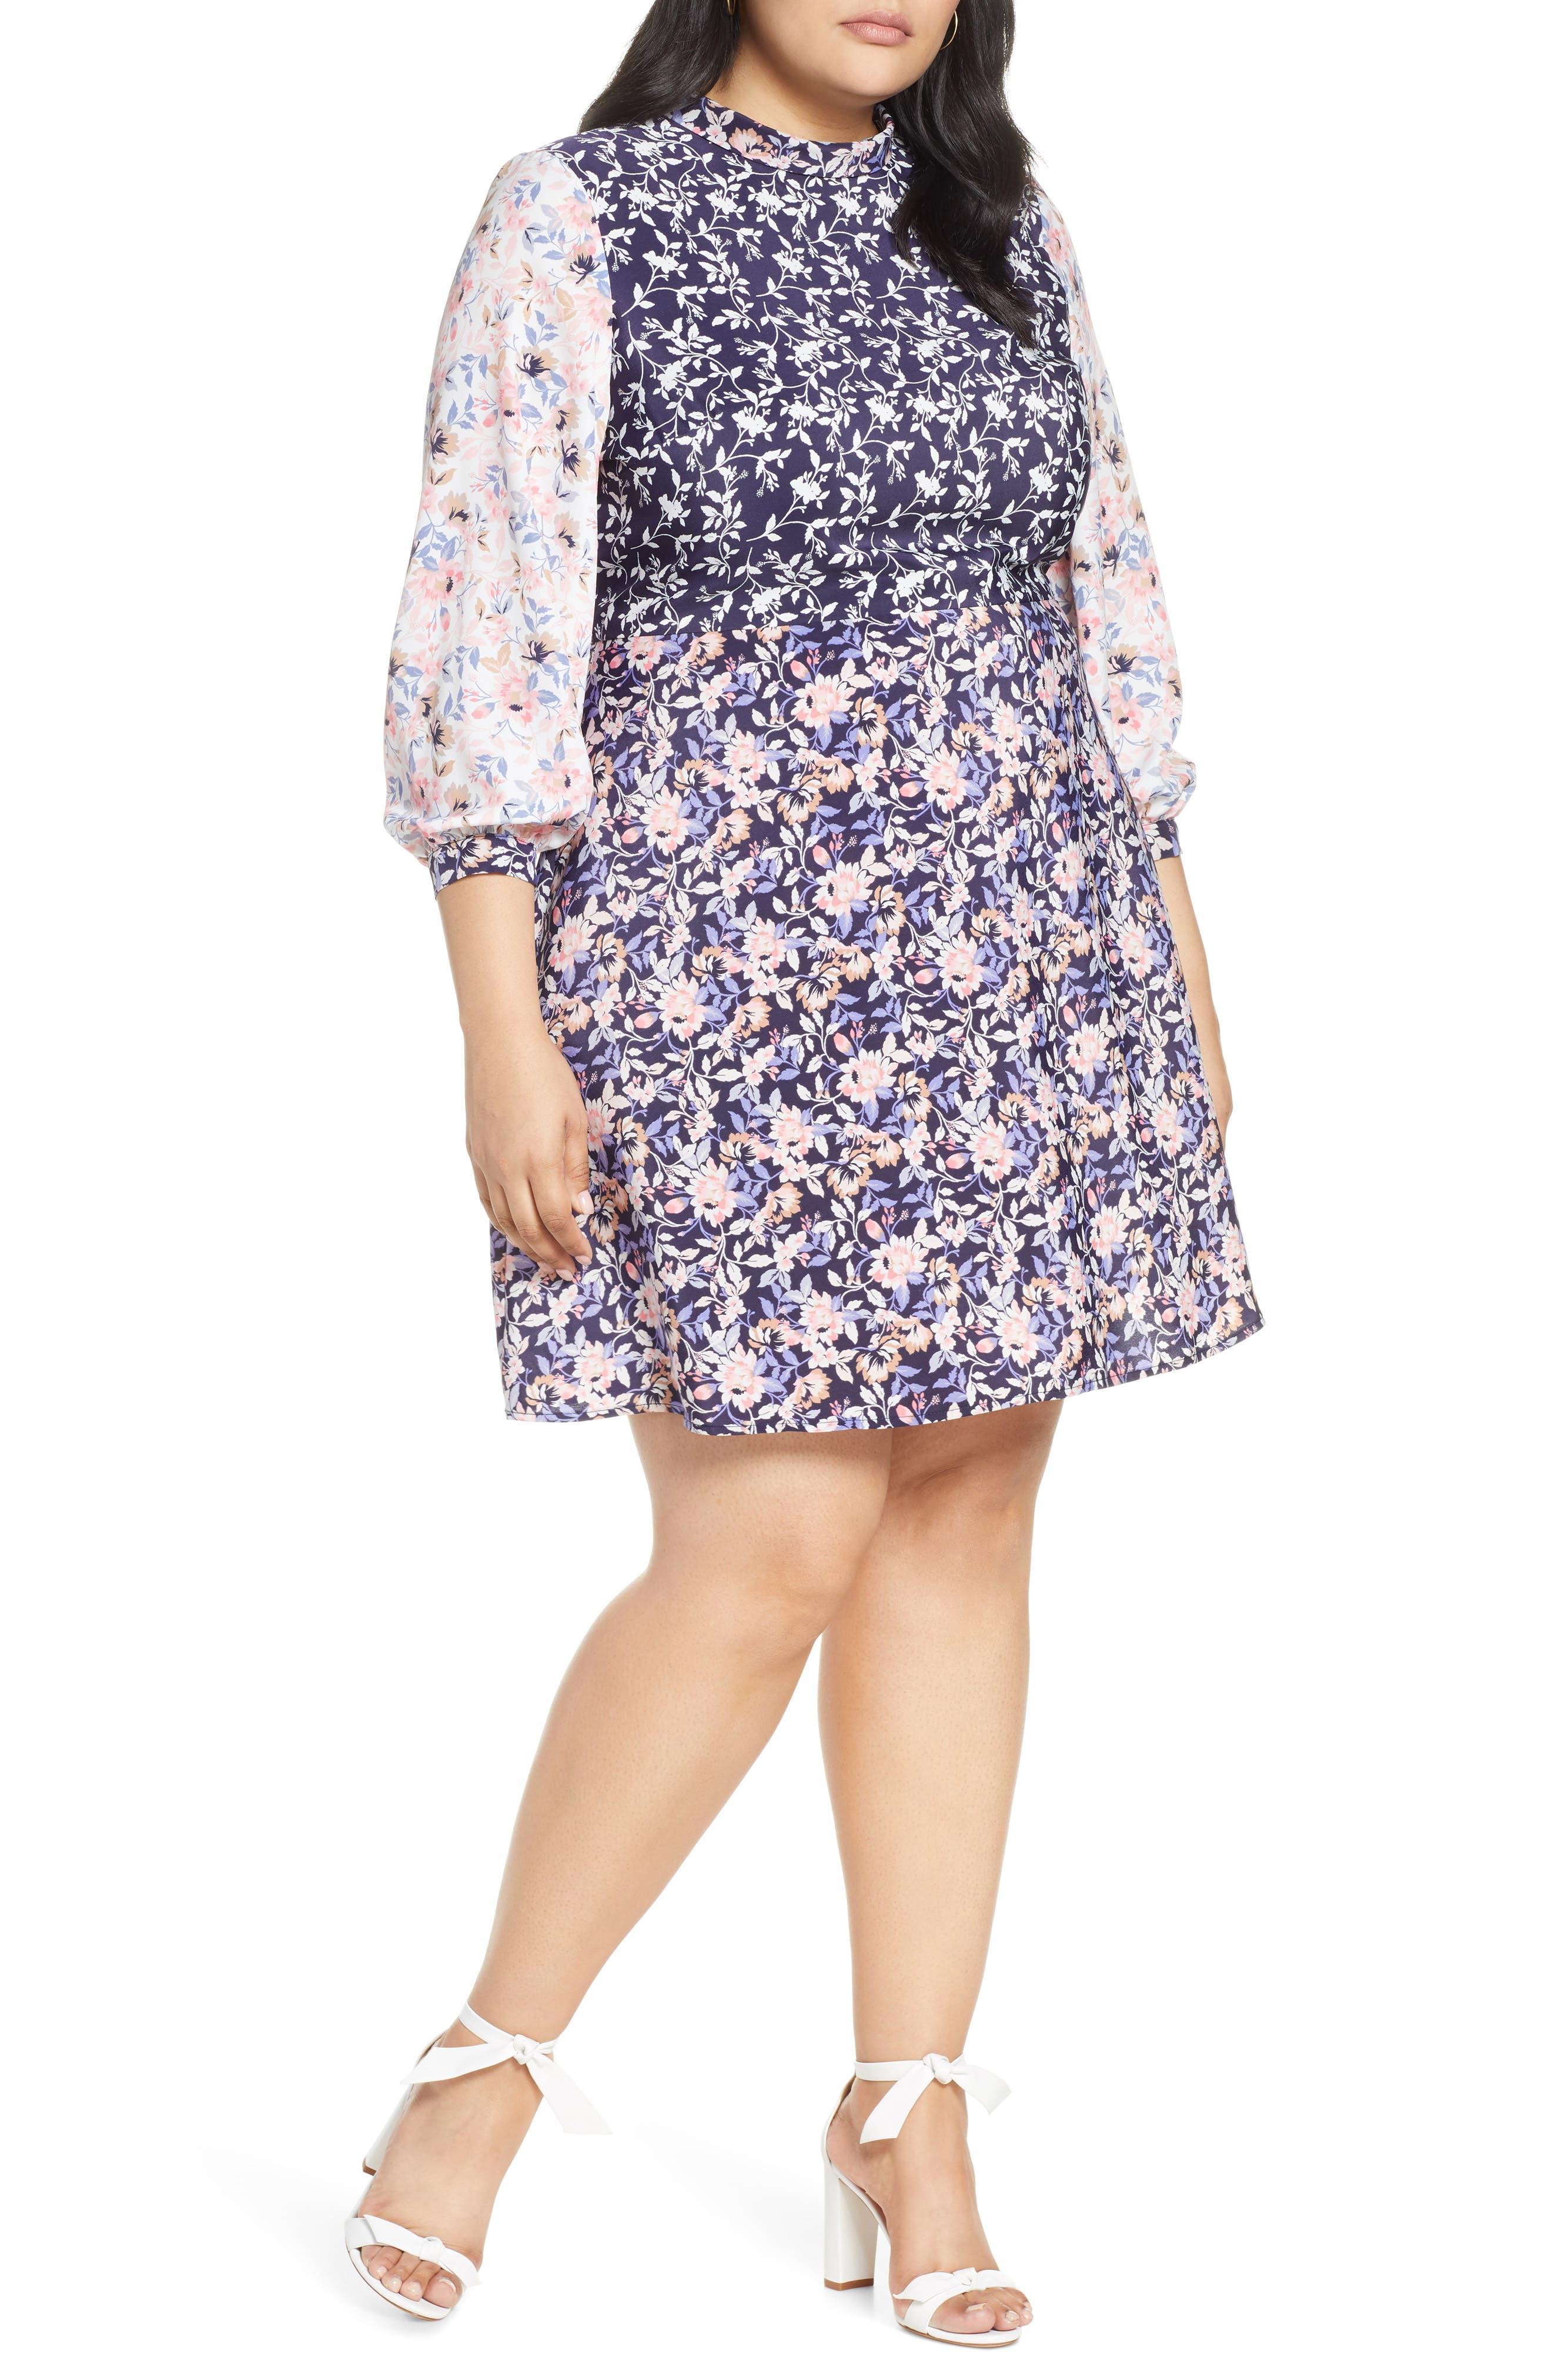 Plus Size 1901 Colorblock Floral Dress, (similar to 1-1) - Pink